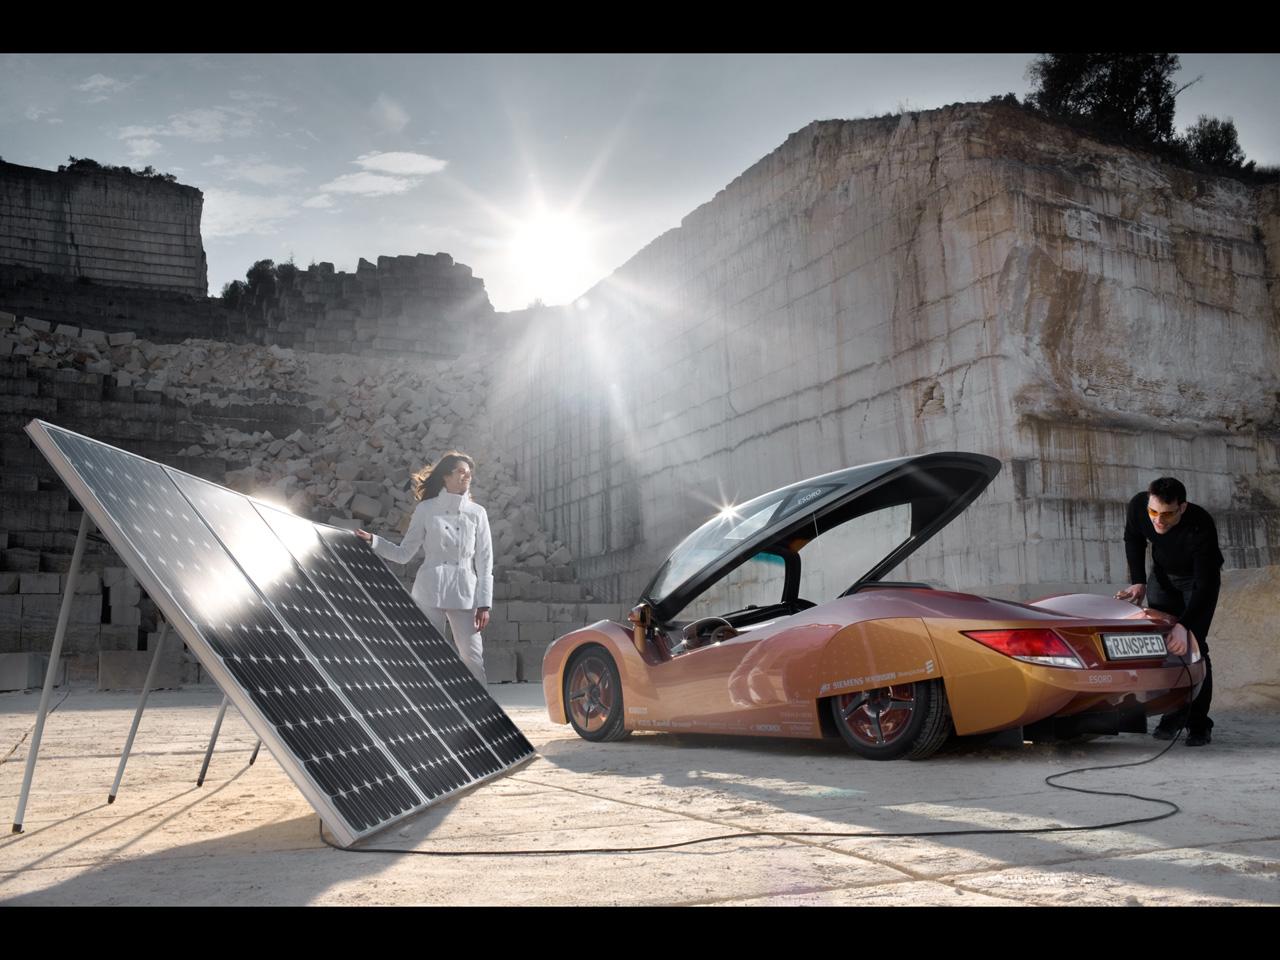 2009 Rinspeed iChange   Solar Panel   1280x960   Wallpaper 1280x960